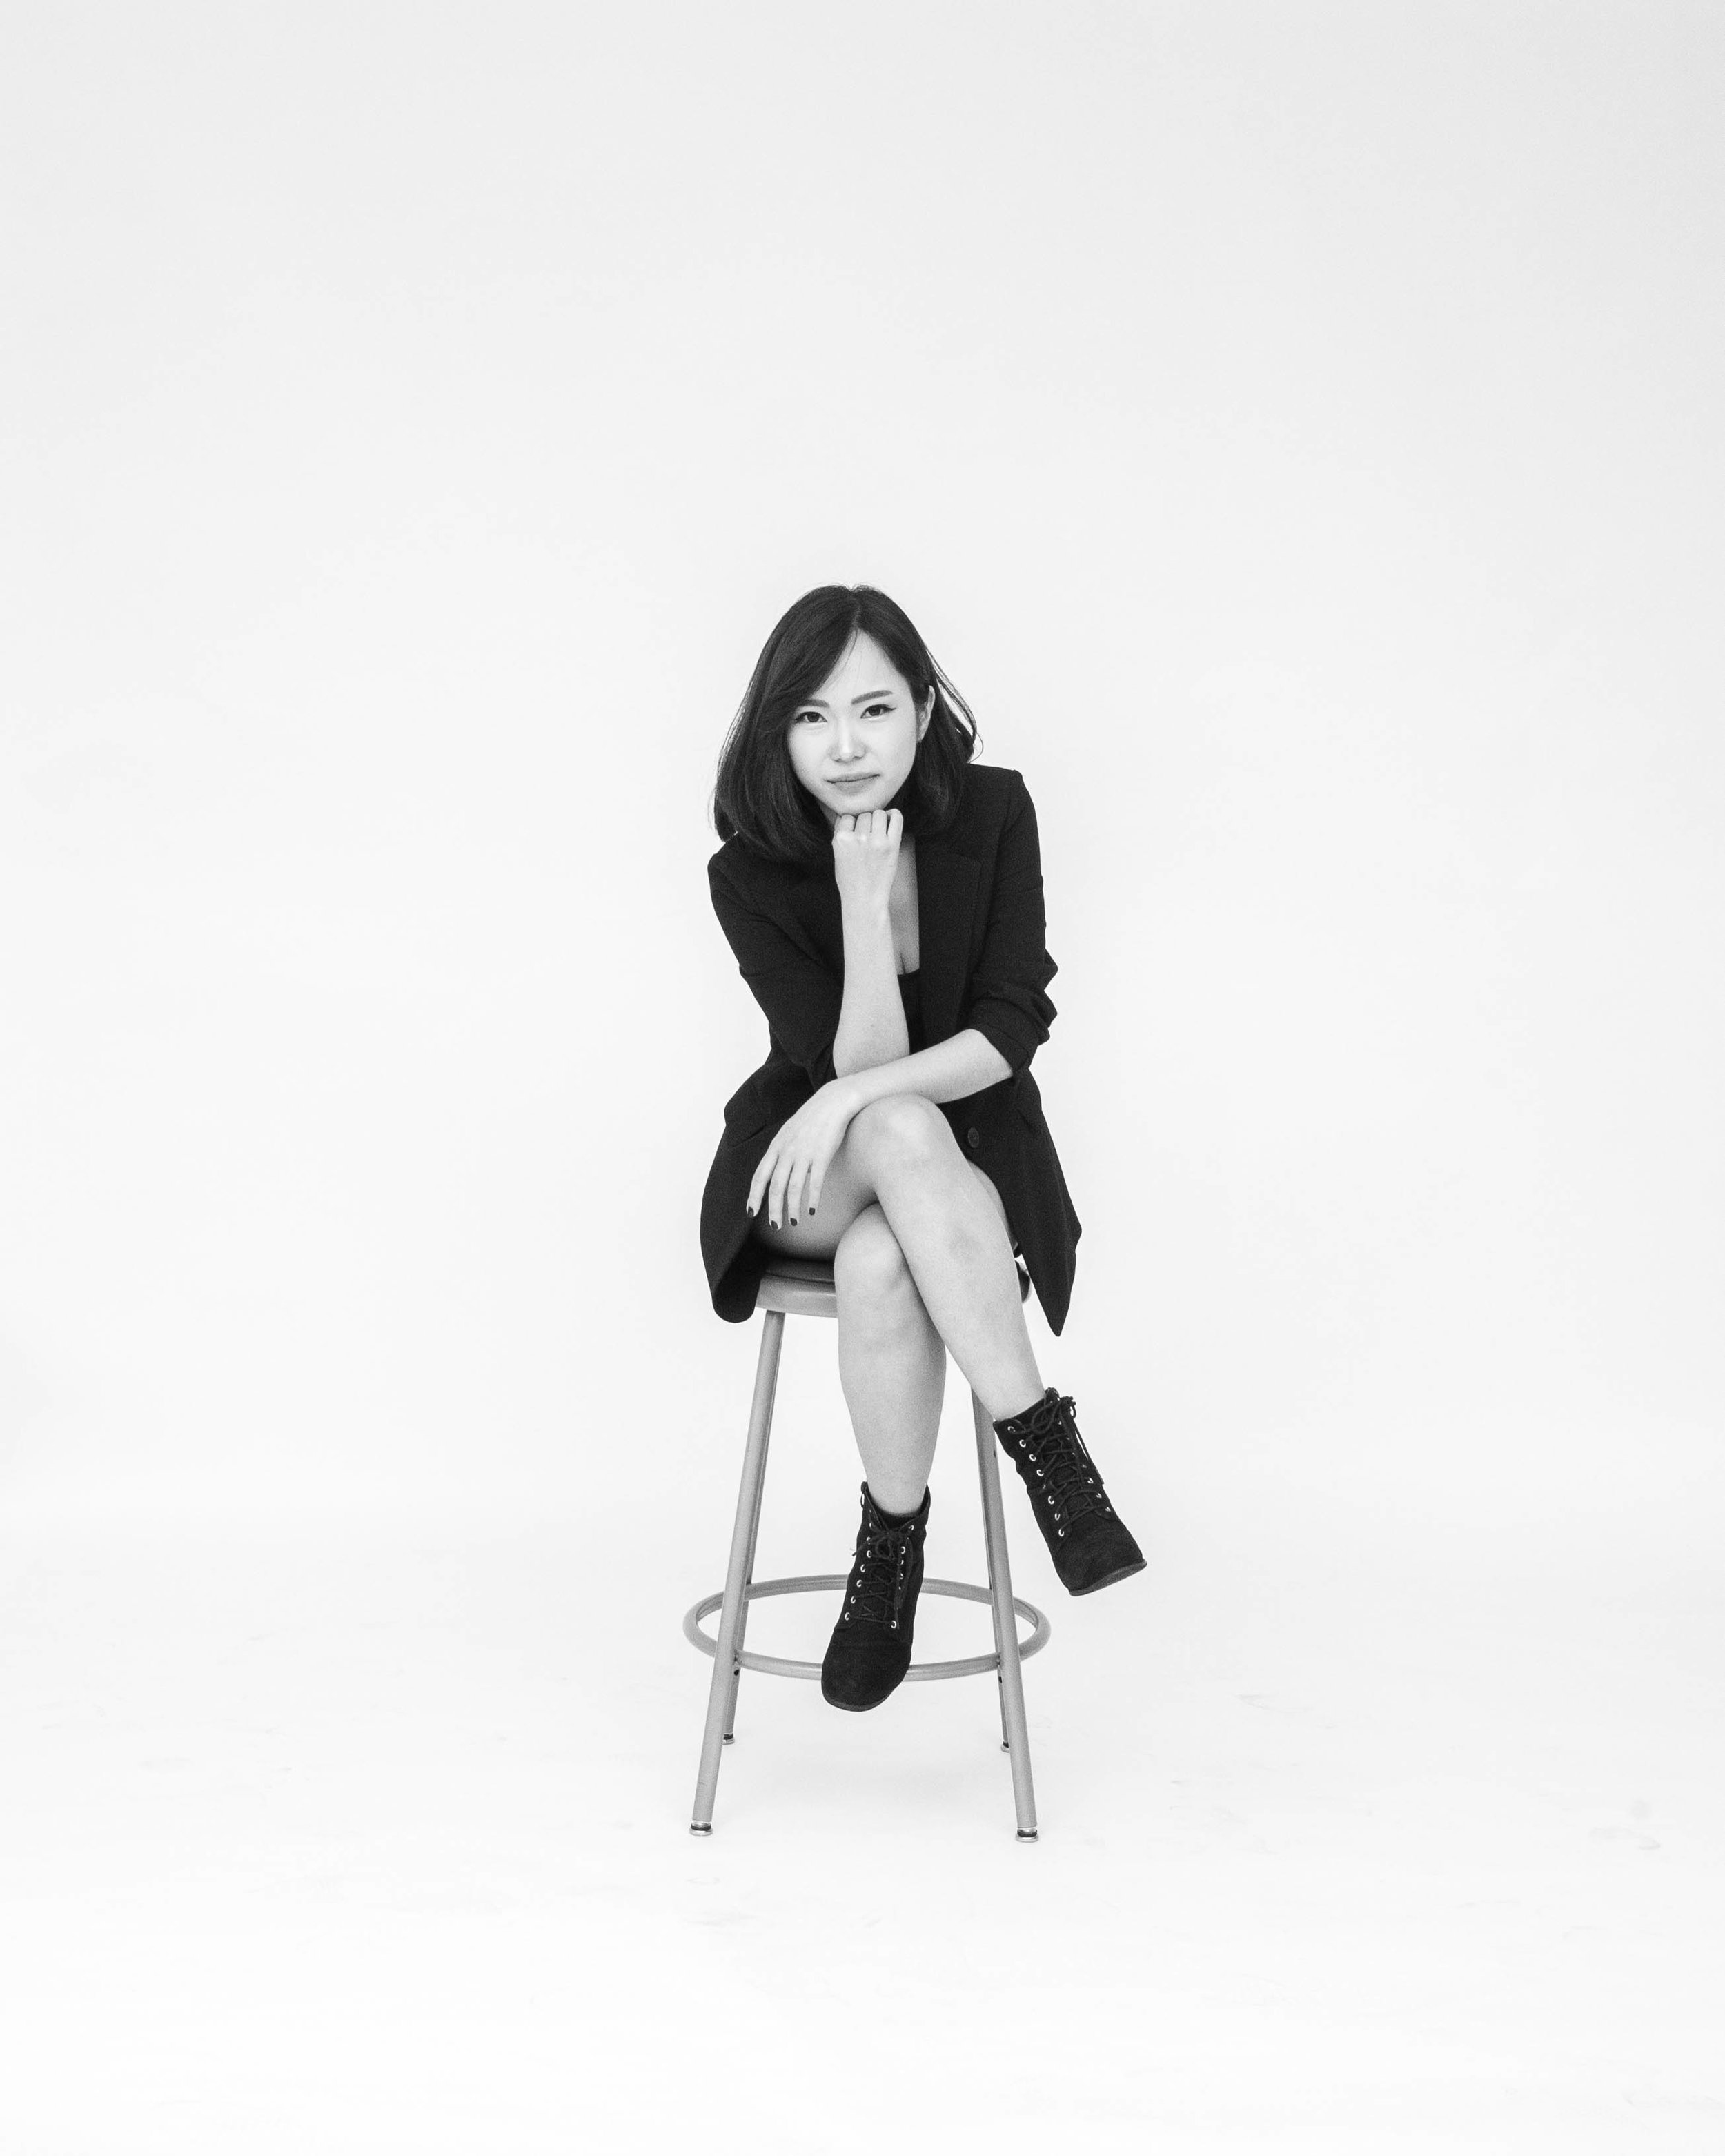 Angela Baek